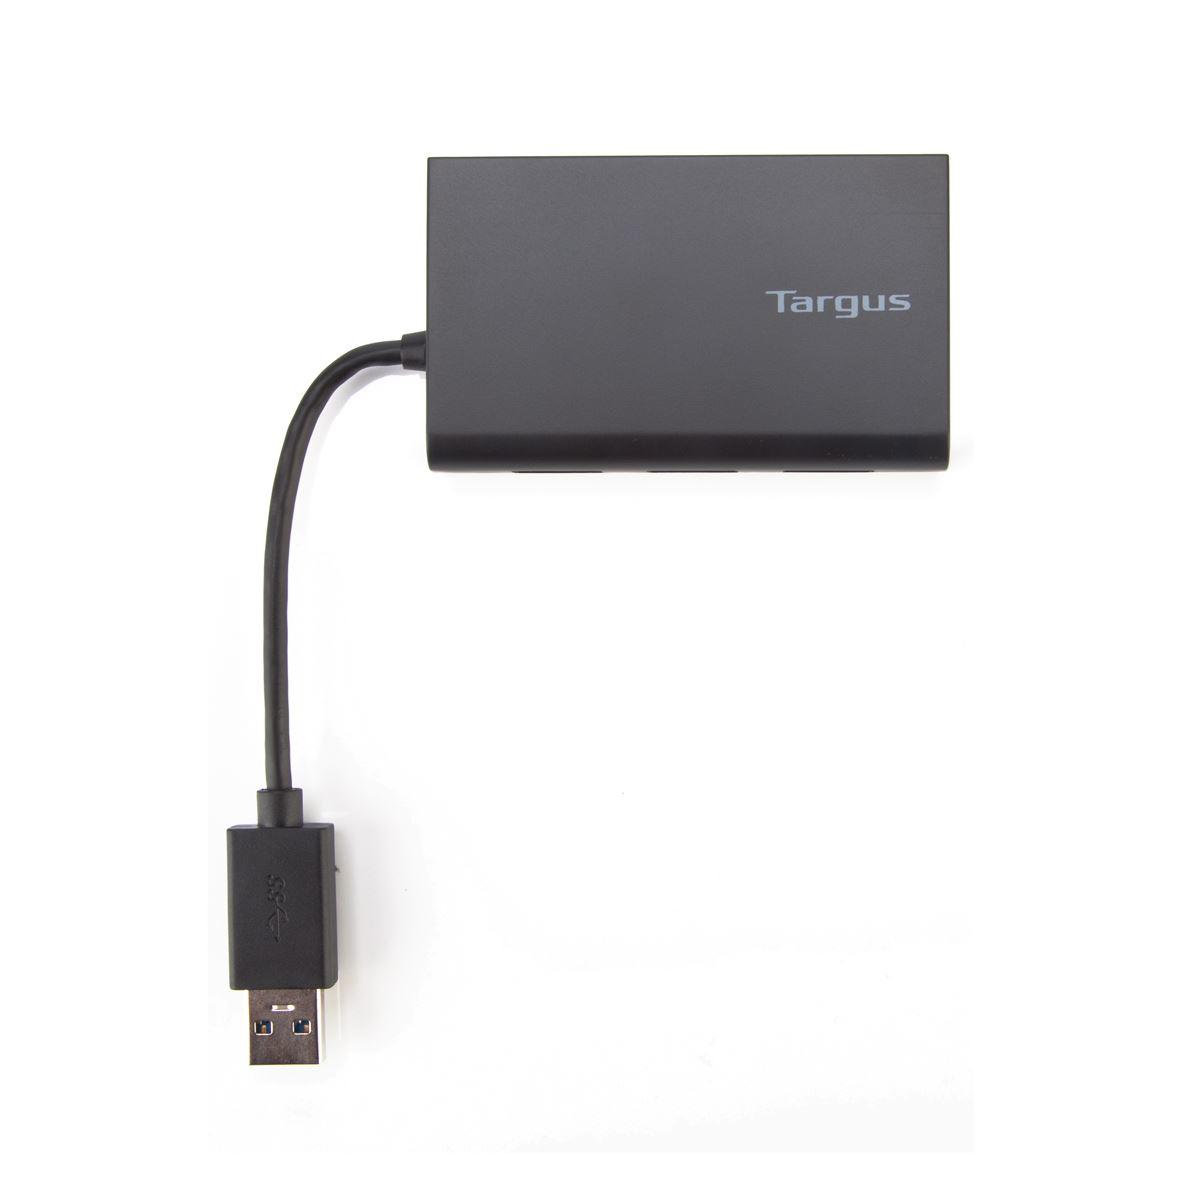 USB 3.0 Hub met Gigabit Ethernet (4 x SuperSpeed USB 3.0 + 1 x 10/100/1000 Mbps LAN)